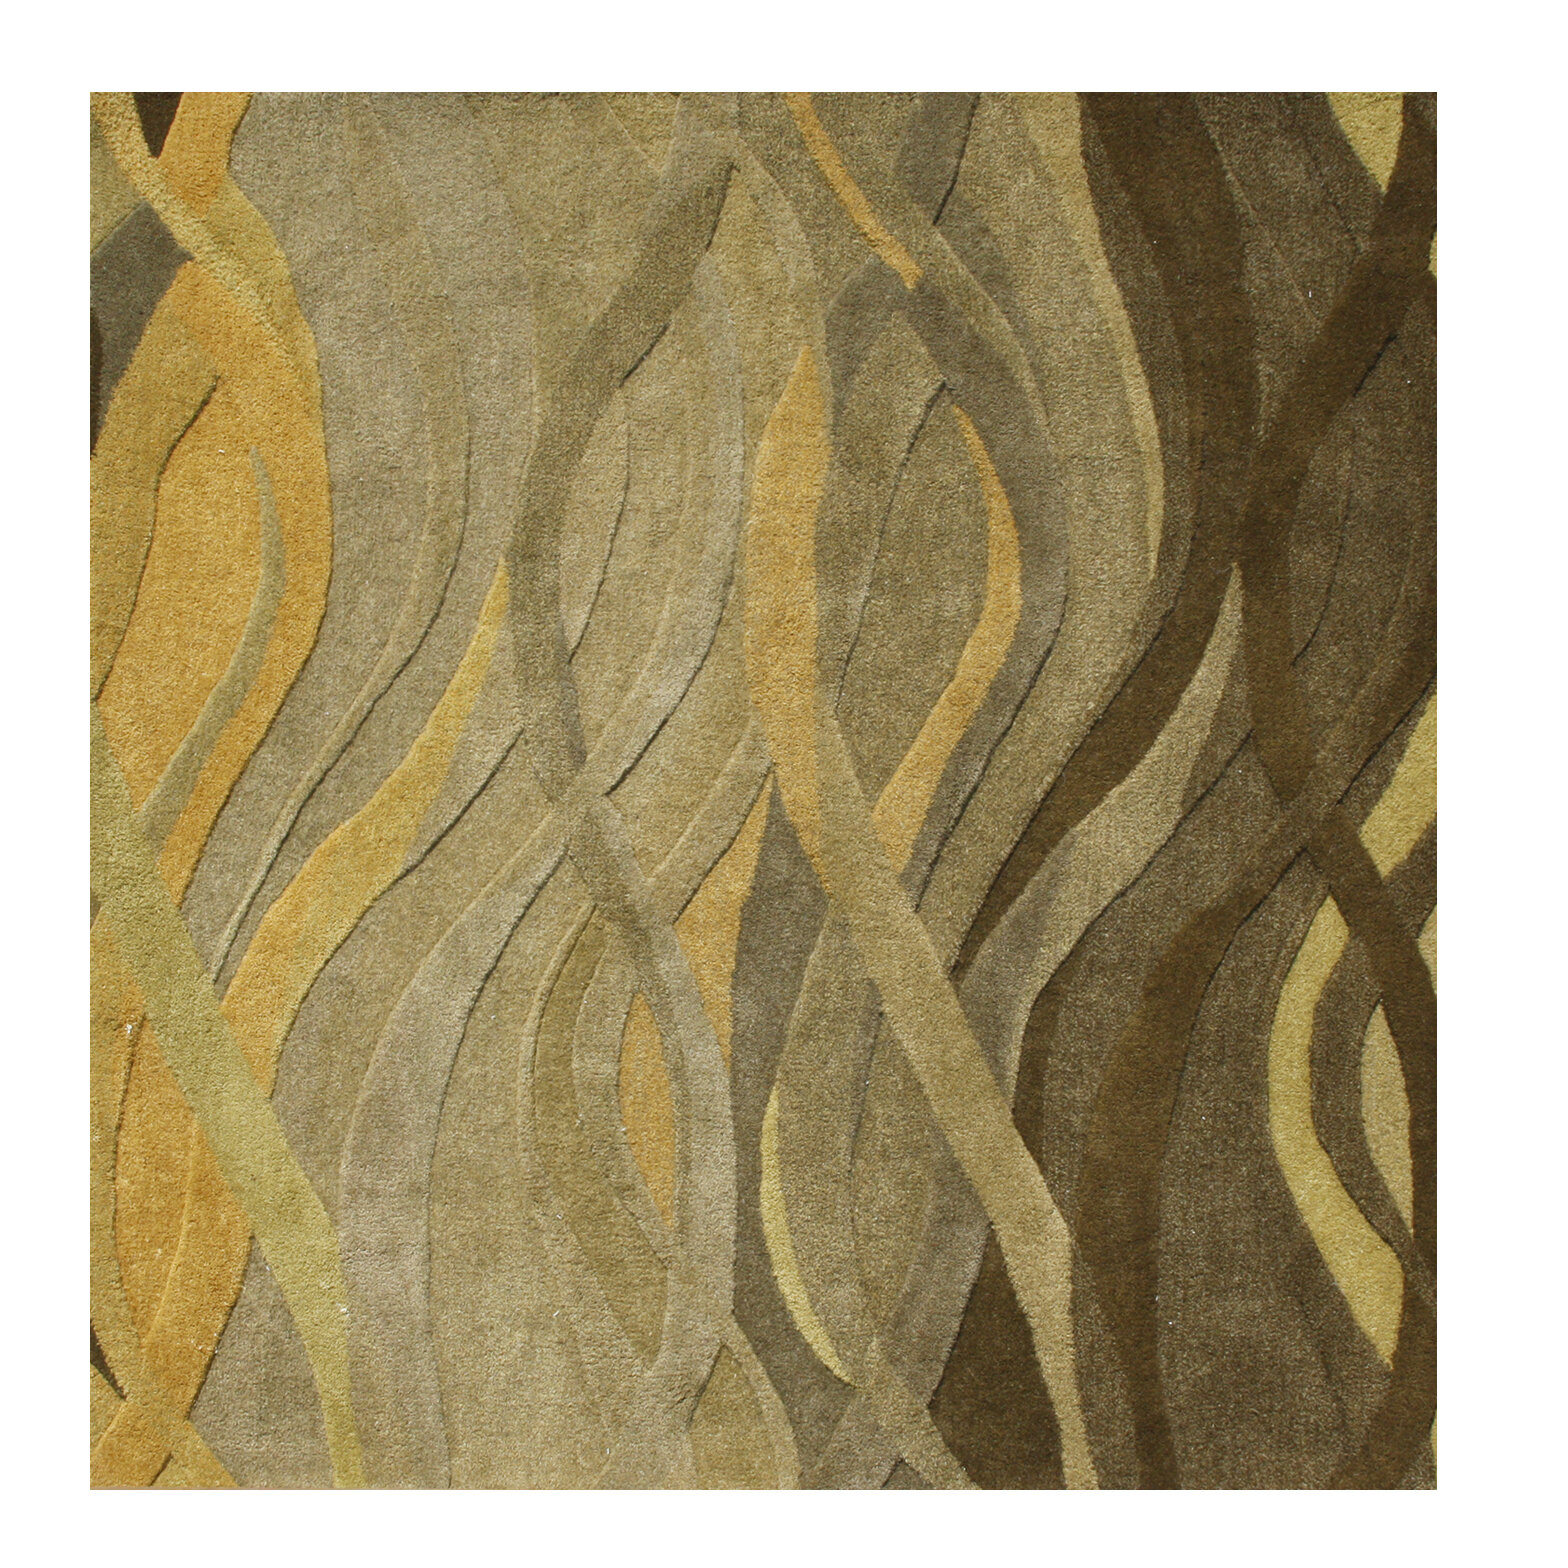 Alliyah Rugs New Zealand Hand Tufted Wool Green Beige Area Rug Reviews Wayfair